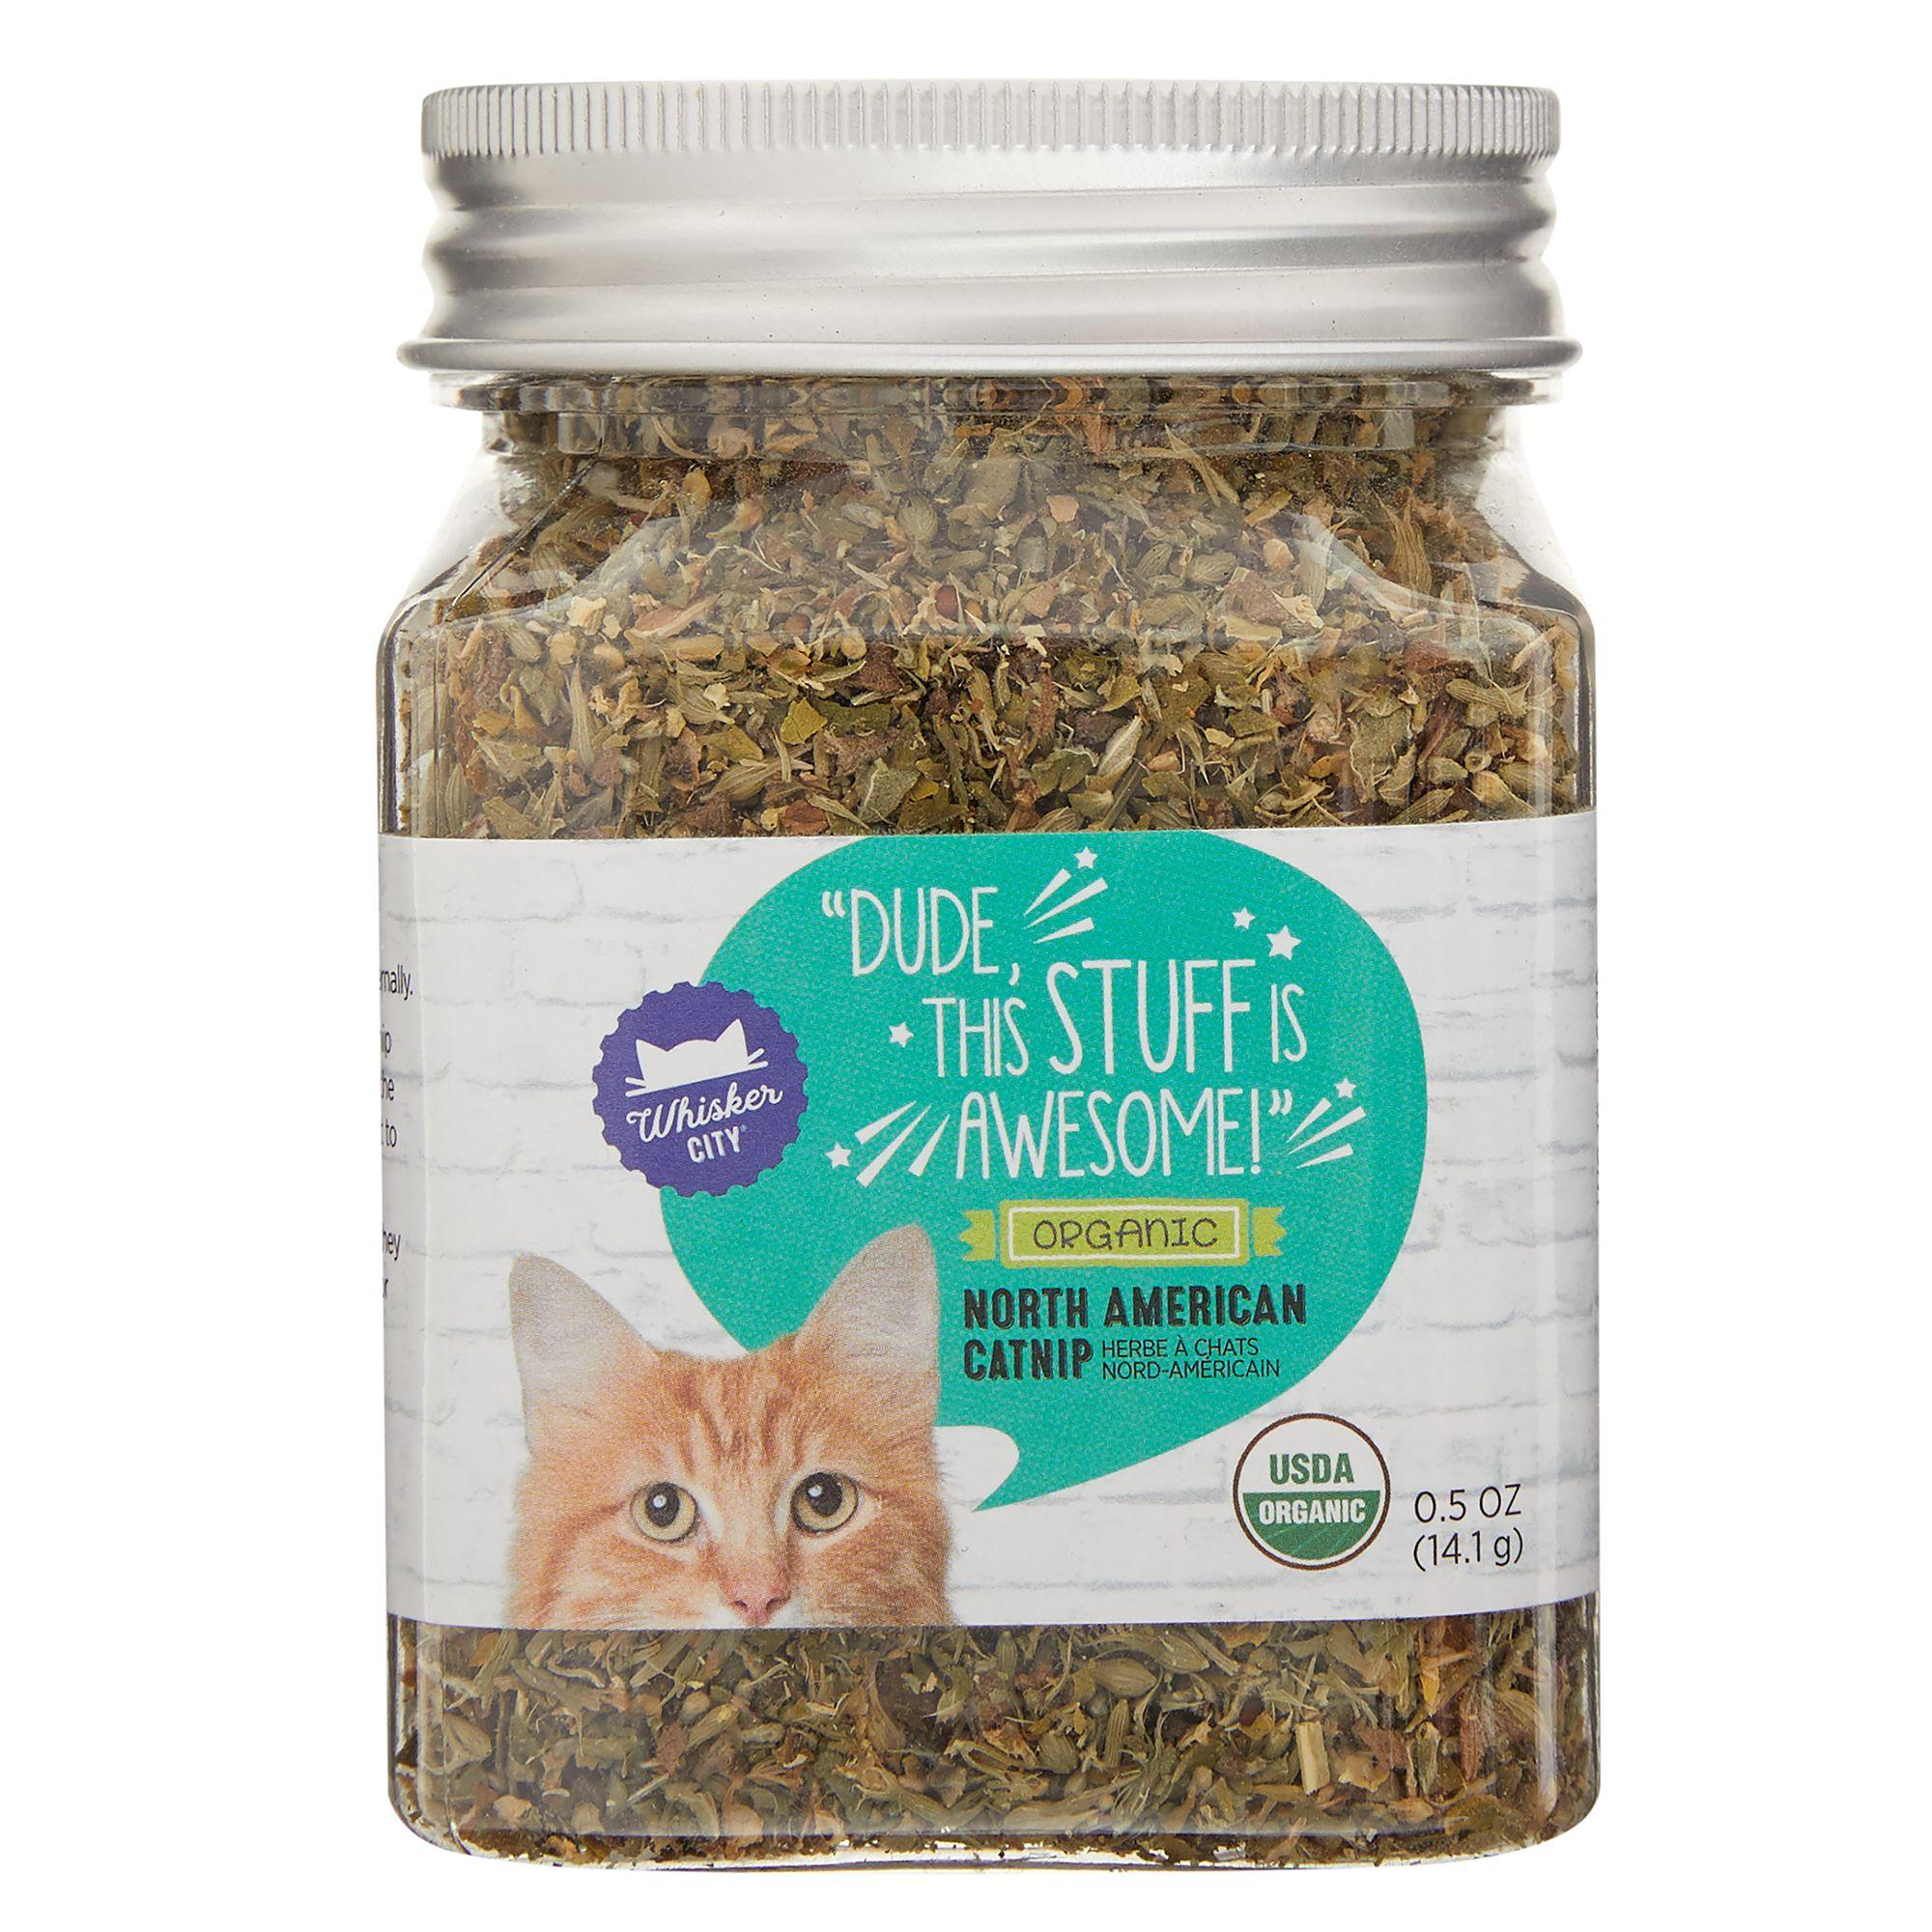 Whisker City Organic Catnip size: 0.5 Oz 5266724